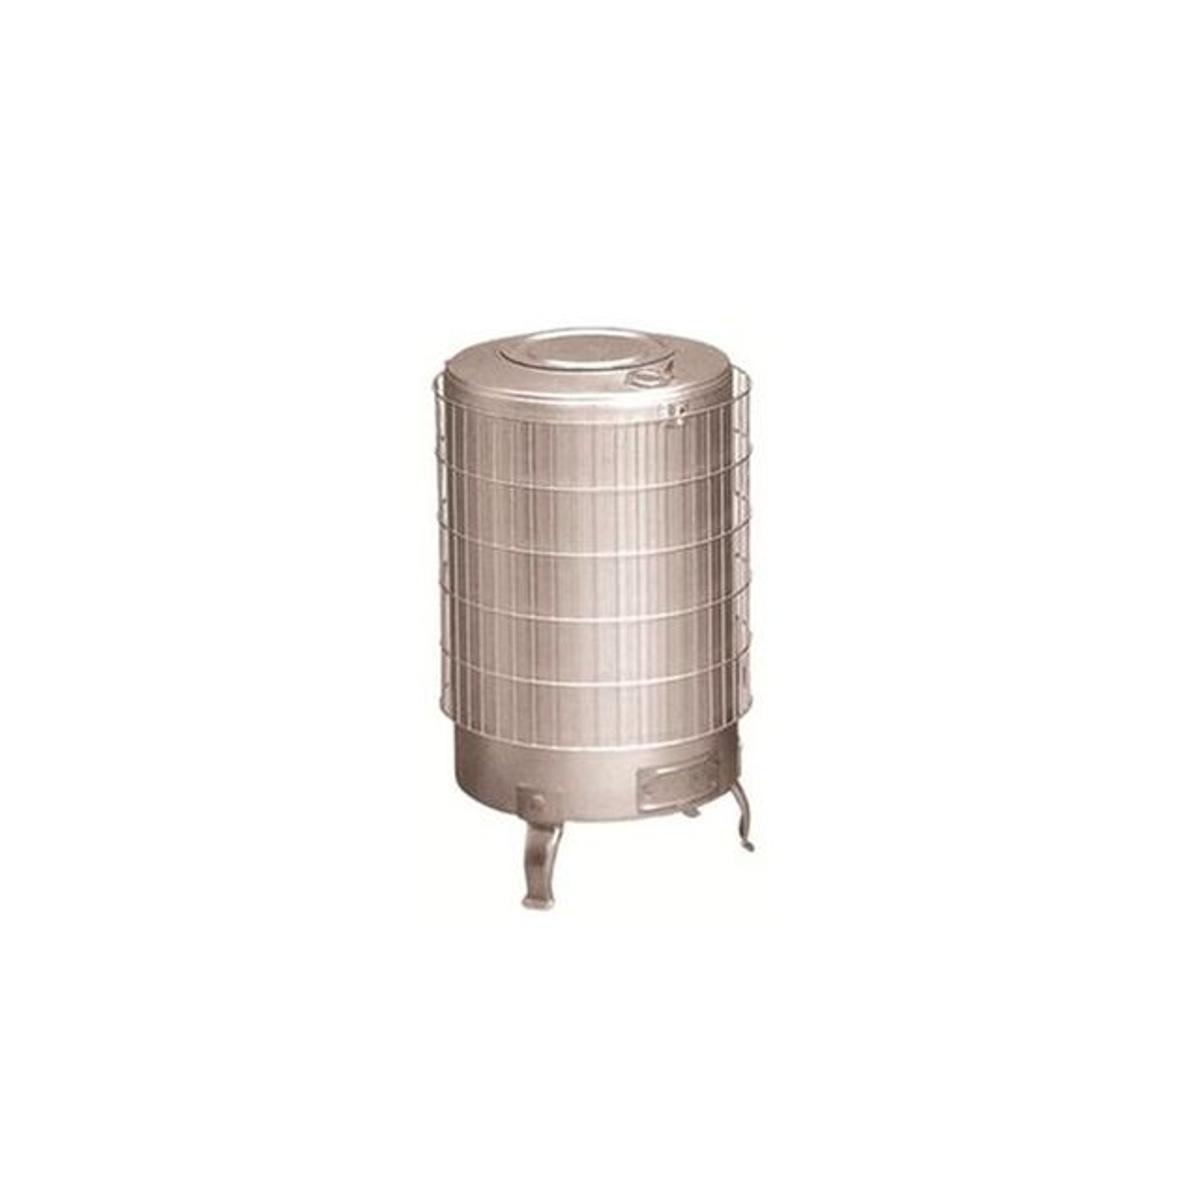 Poêle à bois Turbo 15,1kW Sortie Horizontale Aluminium - Theca -